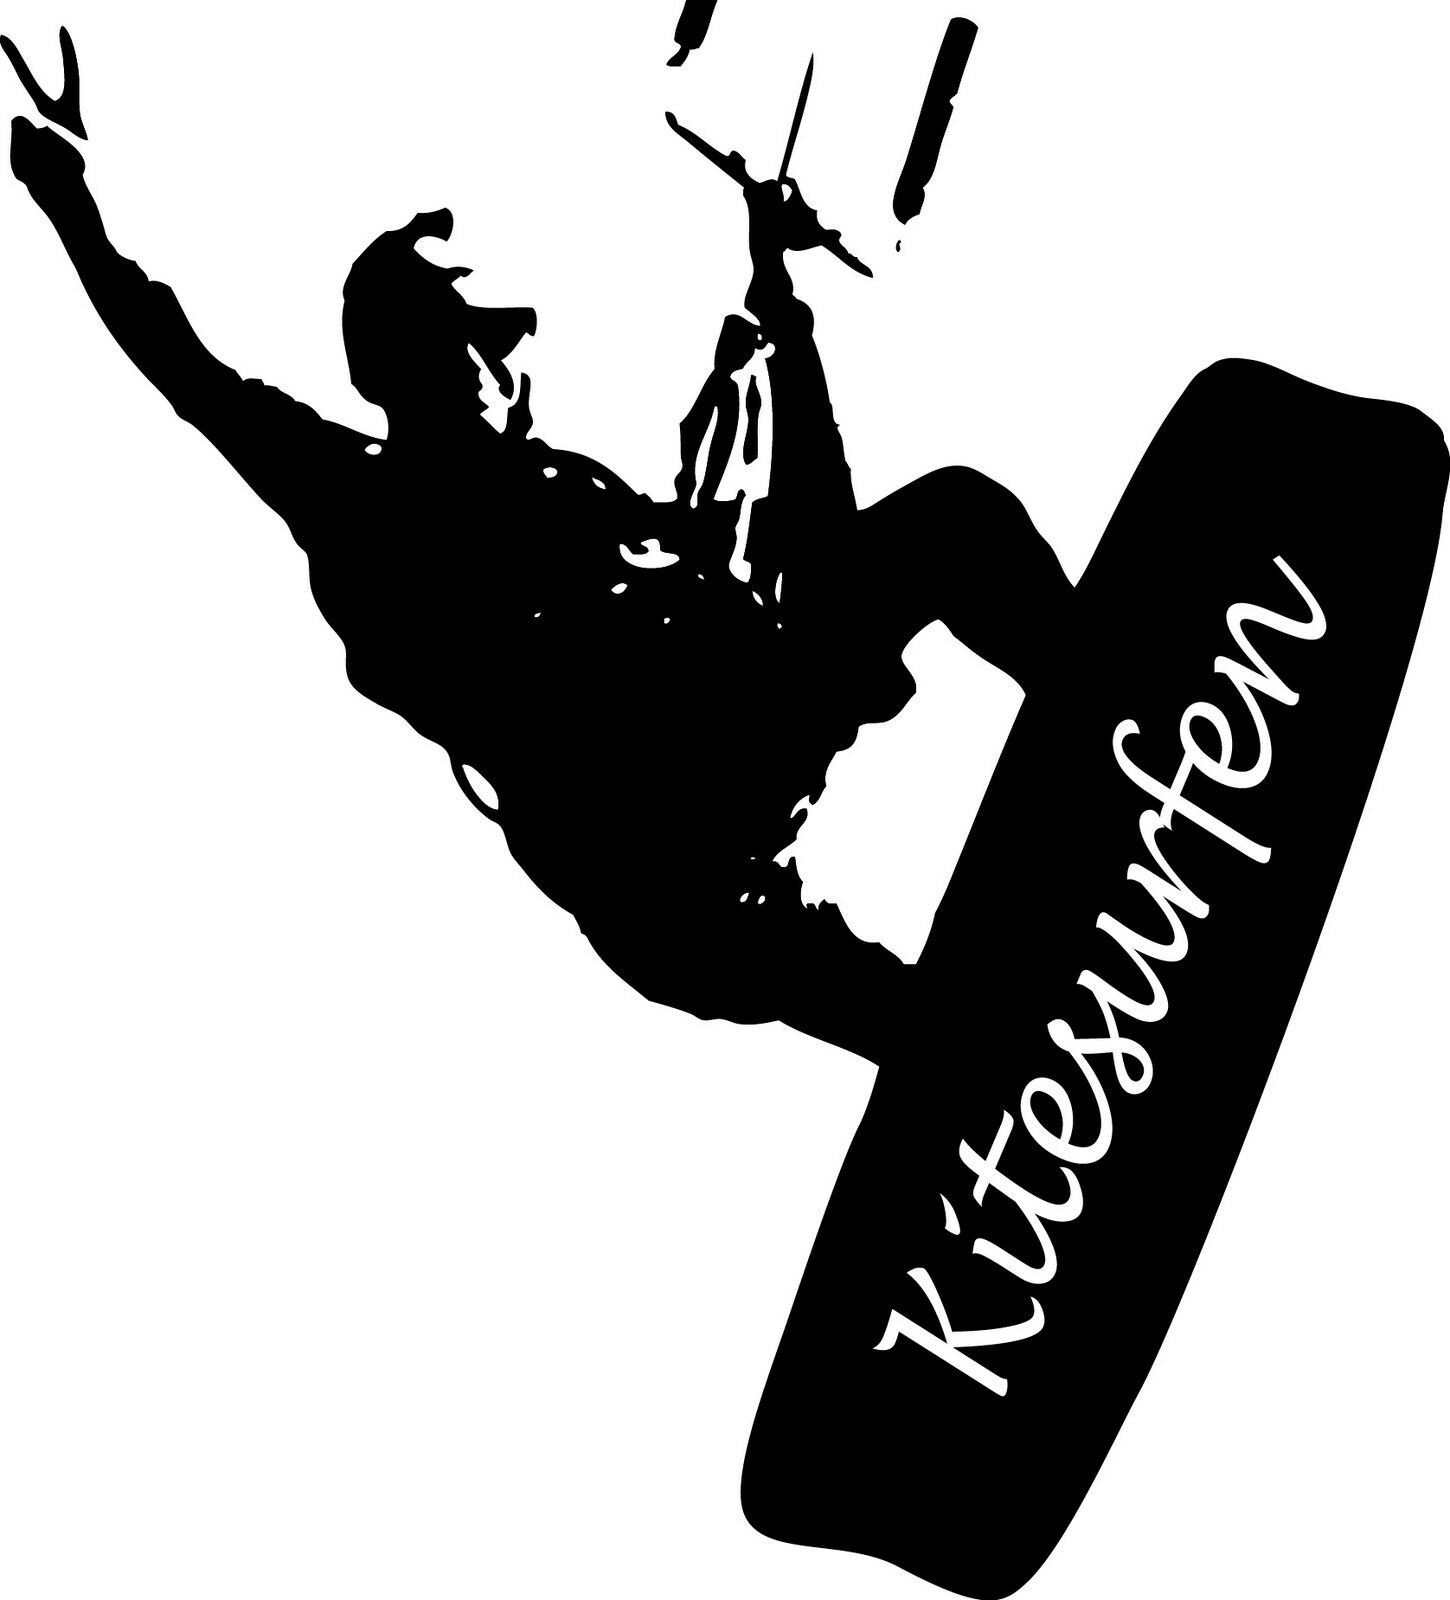 Kitesurfer kitesurfen deportes acuáticos pegatinas murales sticker auto espejo